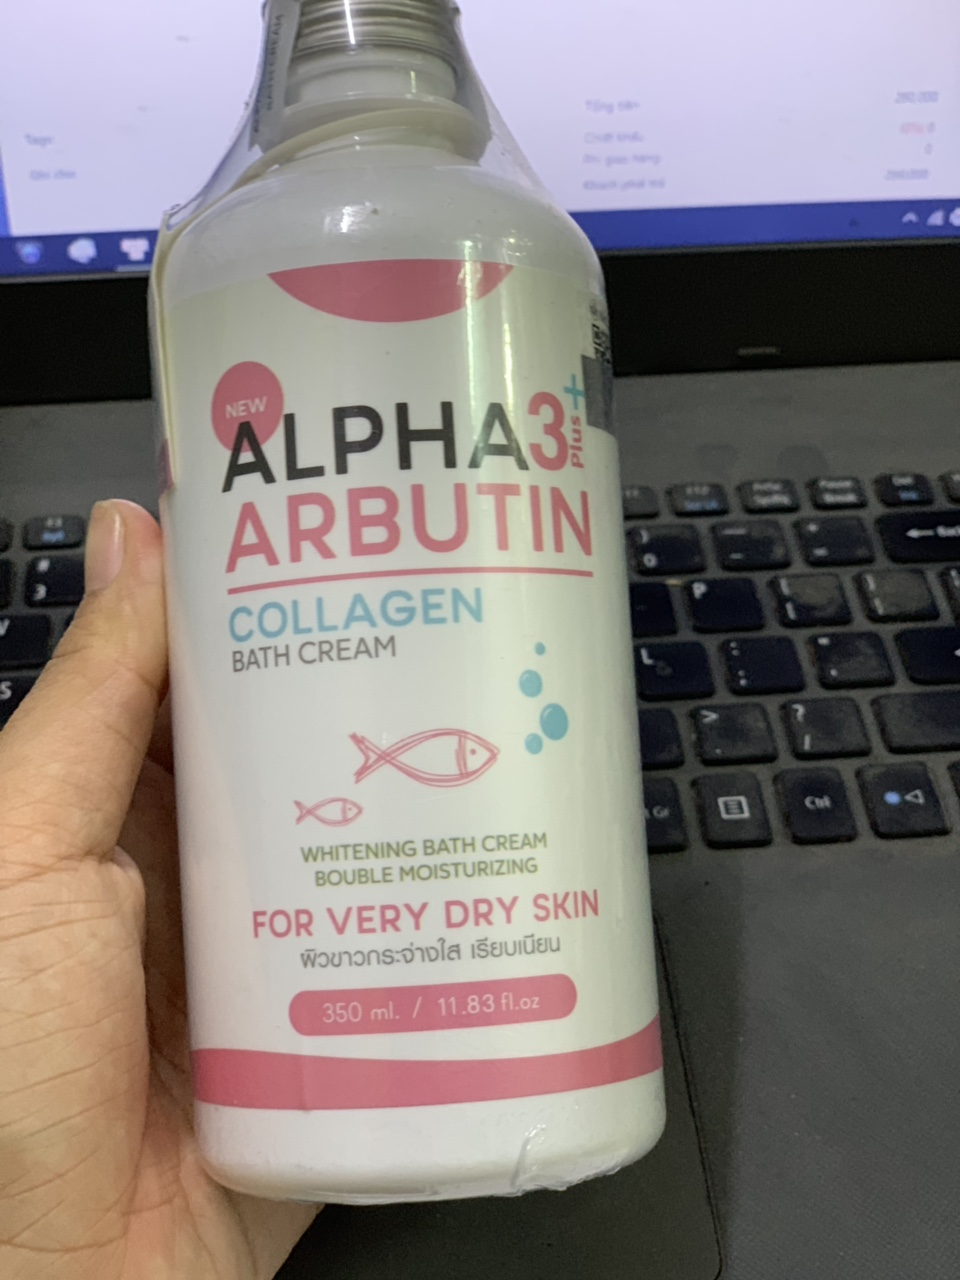 kem-duong-trang-da-sua-tam-duong-trang-da-alpha-arbutin-3-plus-collagen-bath-cream-350ml-thai-lan-2483